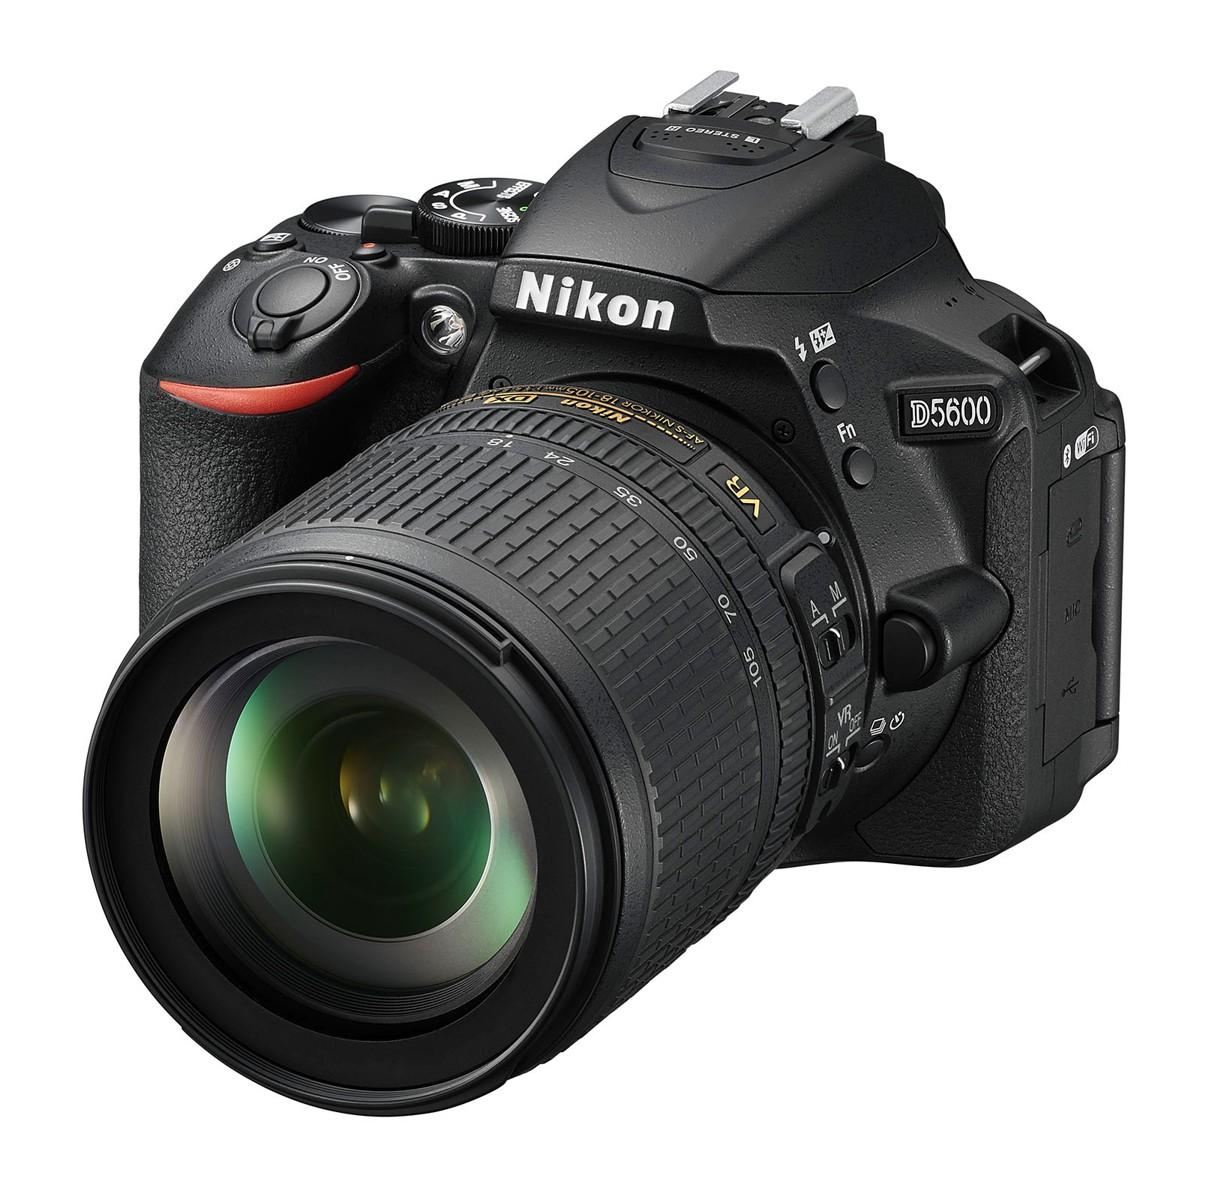 Nikon D5600 + 18-105 mm AF-S VR II černý, CashBack 1350 Kč